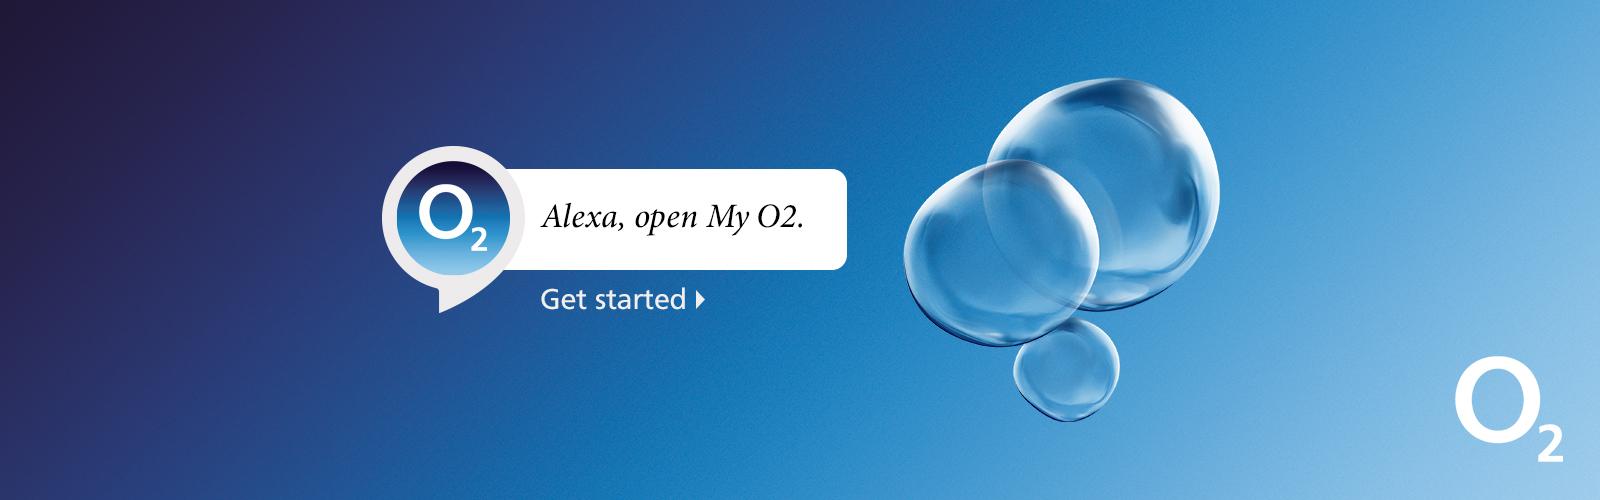 my-o2-alexa-amazon-generic-1600-190717.jpg